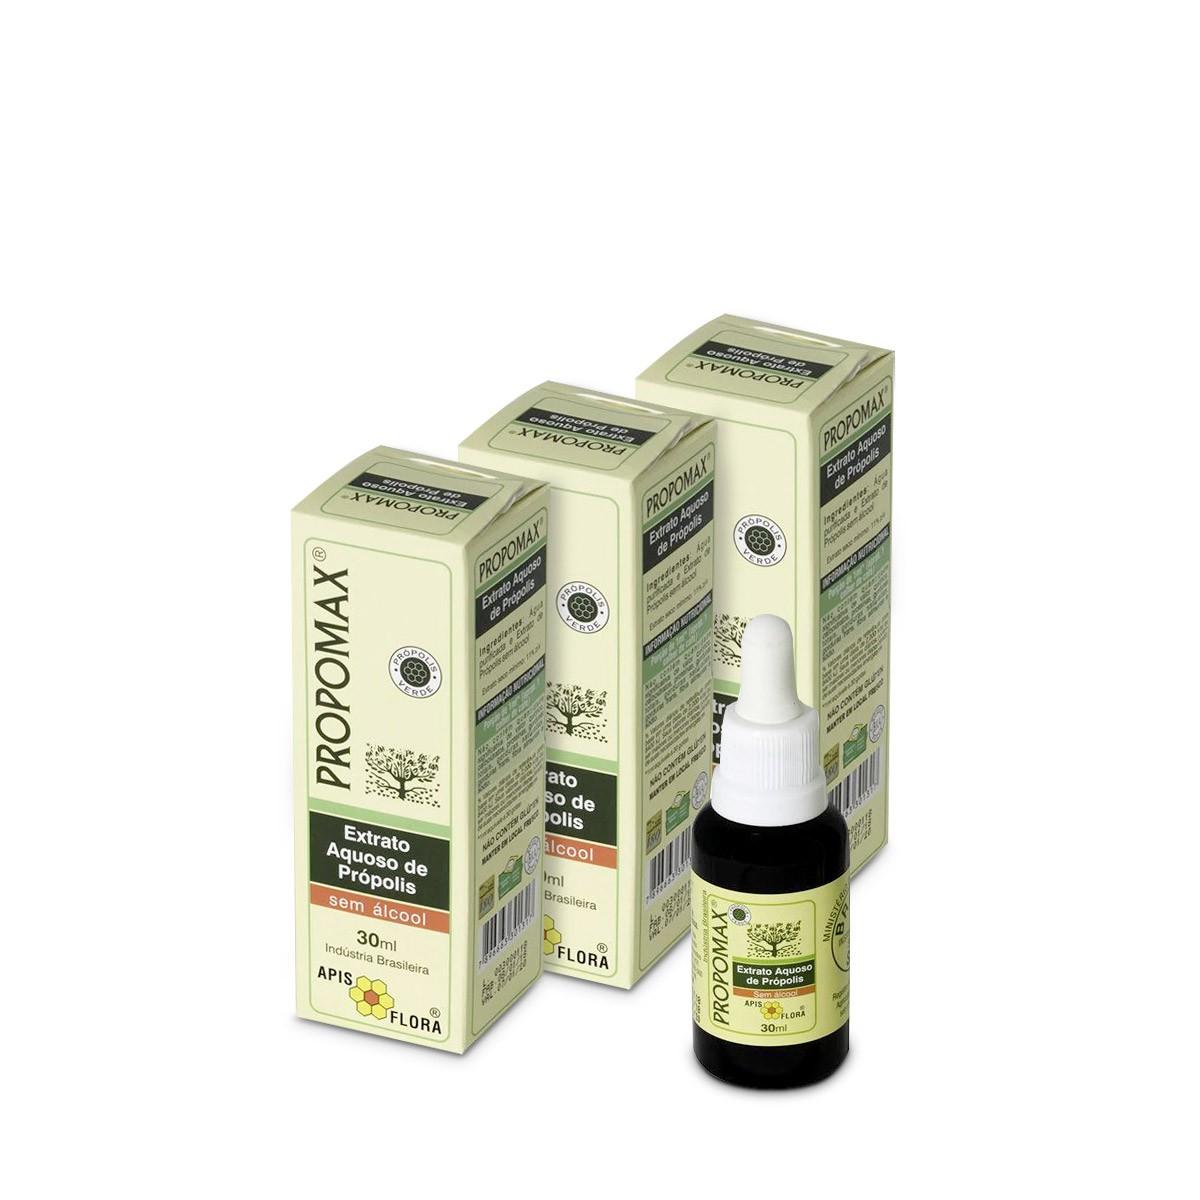 Kit 3 Propomax Extrato de Própolis Aquoso Sem Álcool